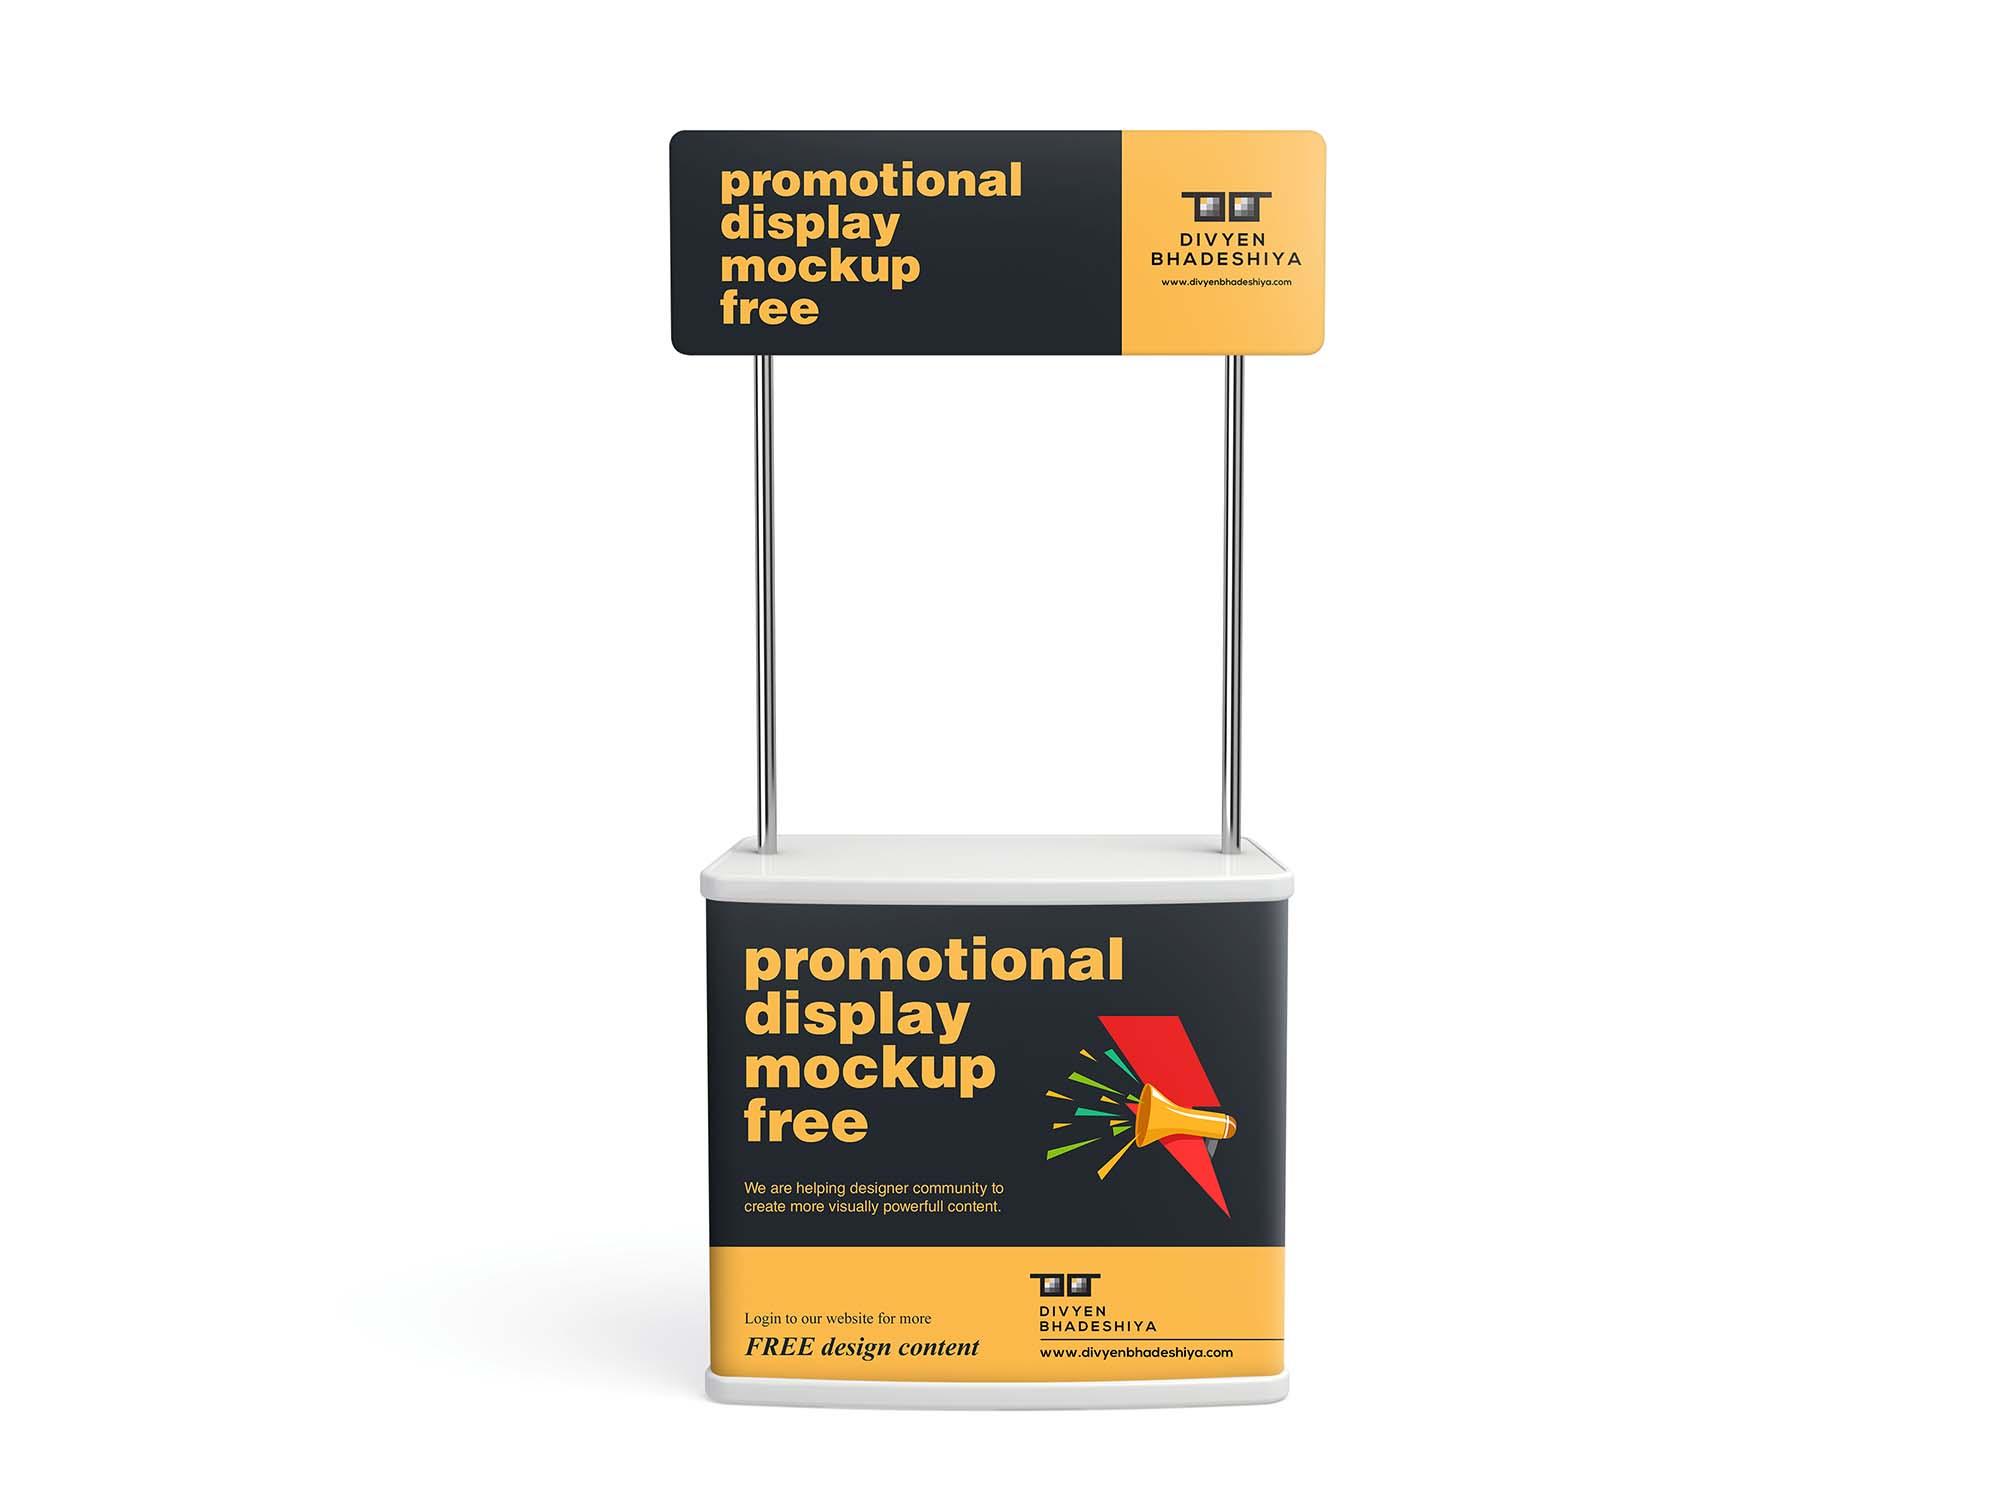 Promotional Display Mockup